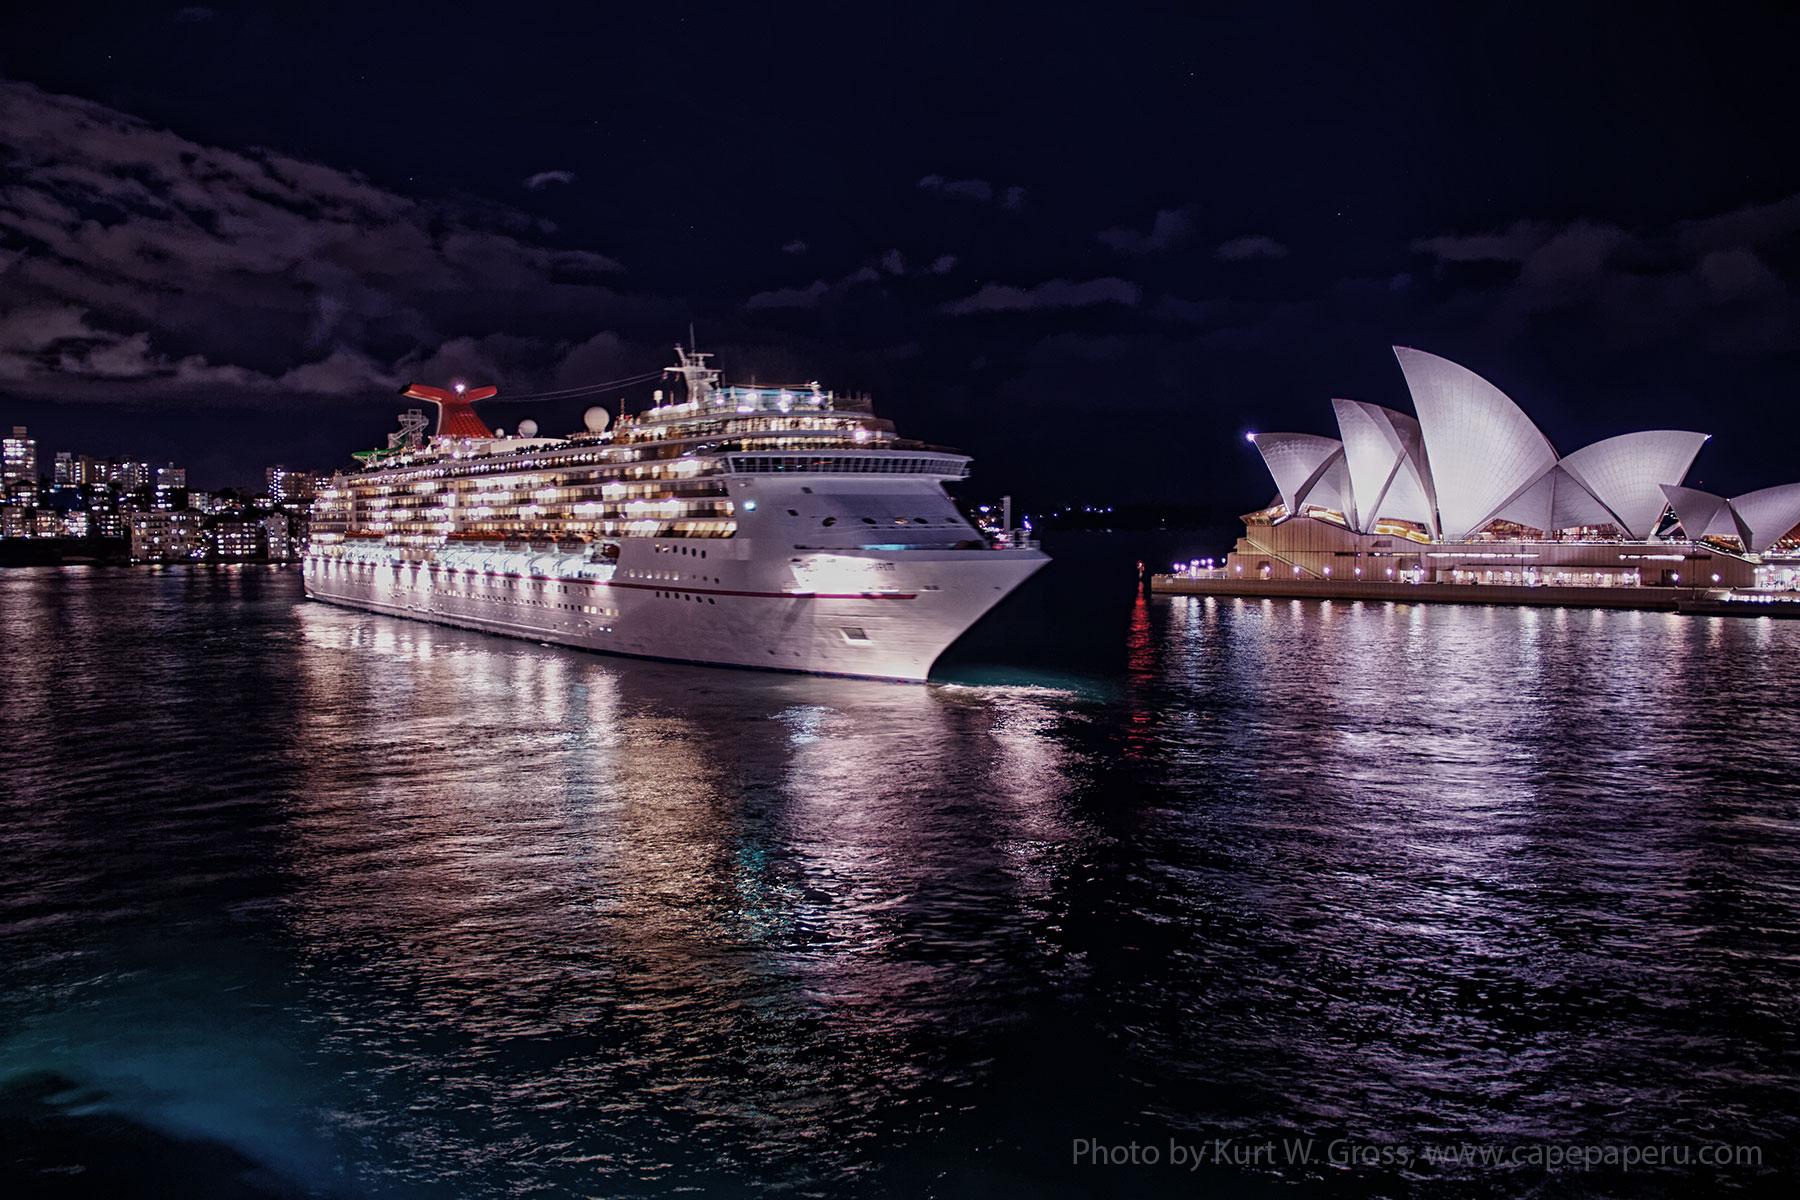 Sydney Harbour Tall Ships, Australia